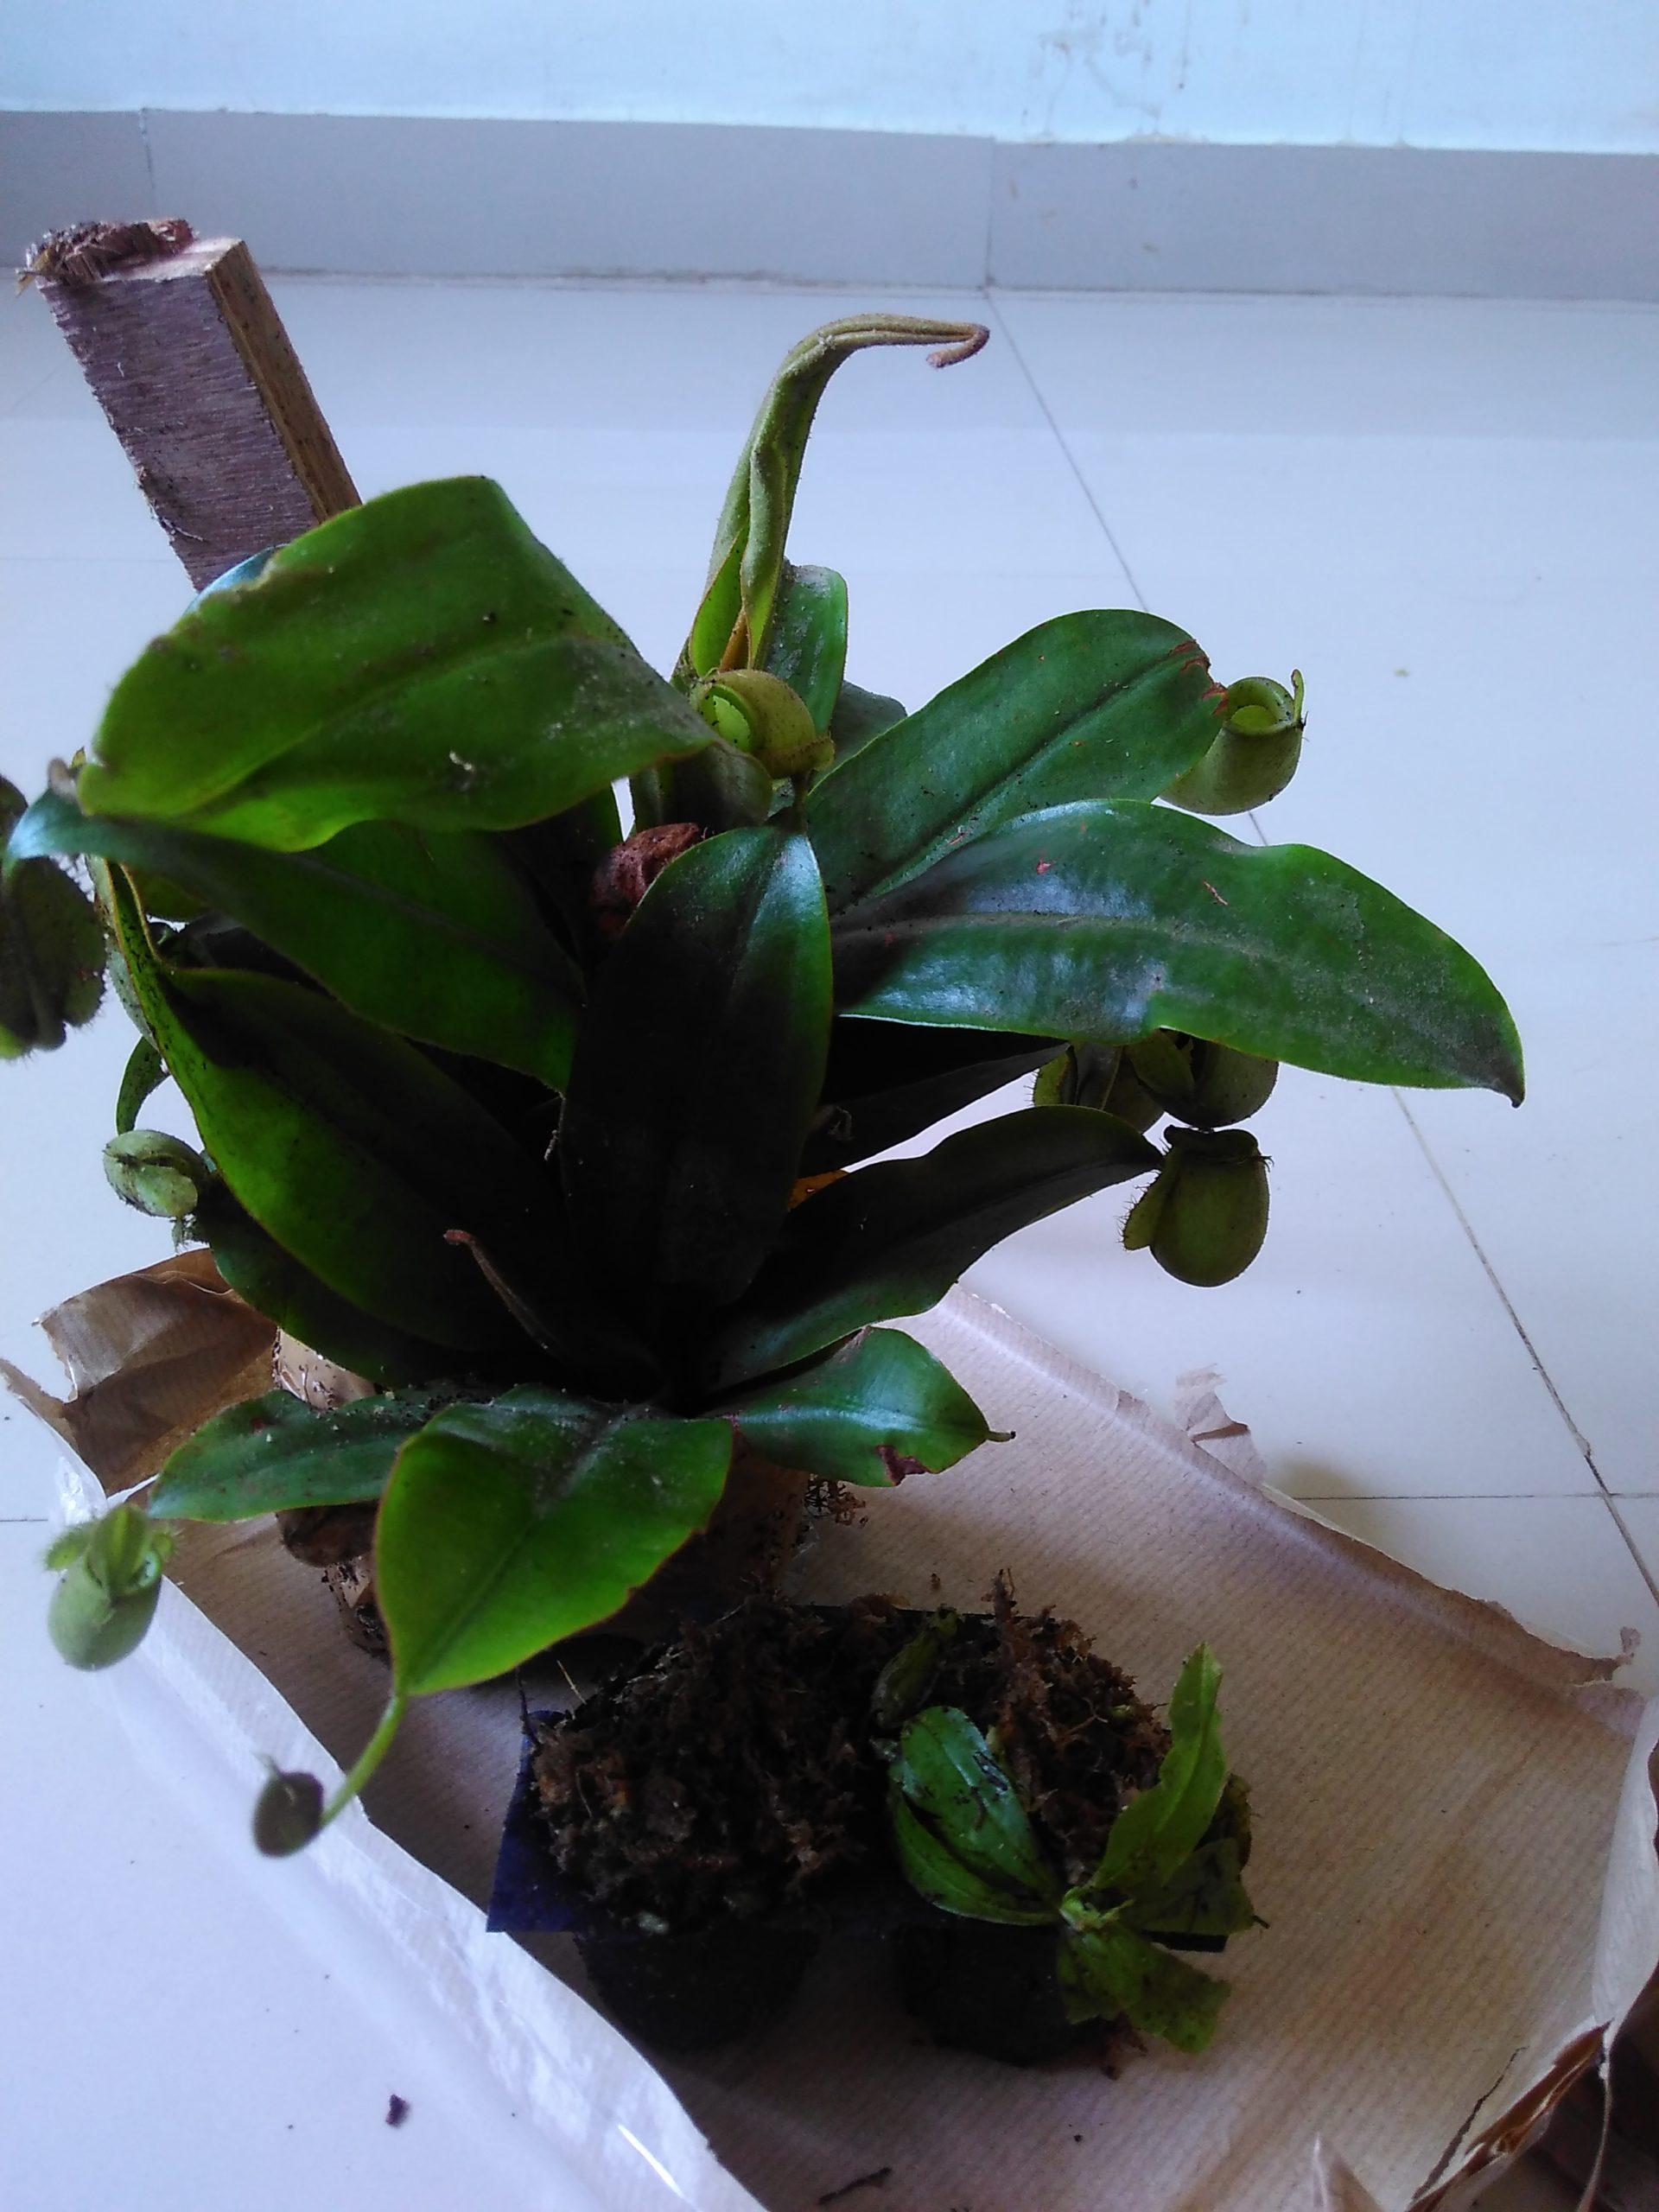 Unboxing nepenthes ampullaria